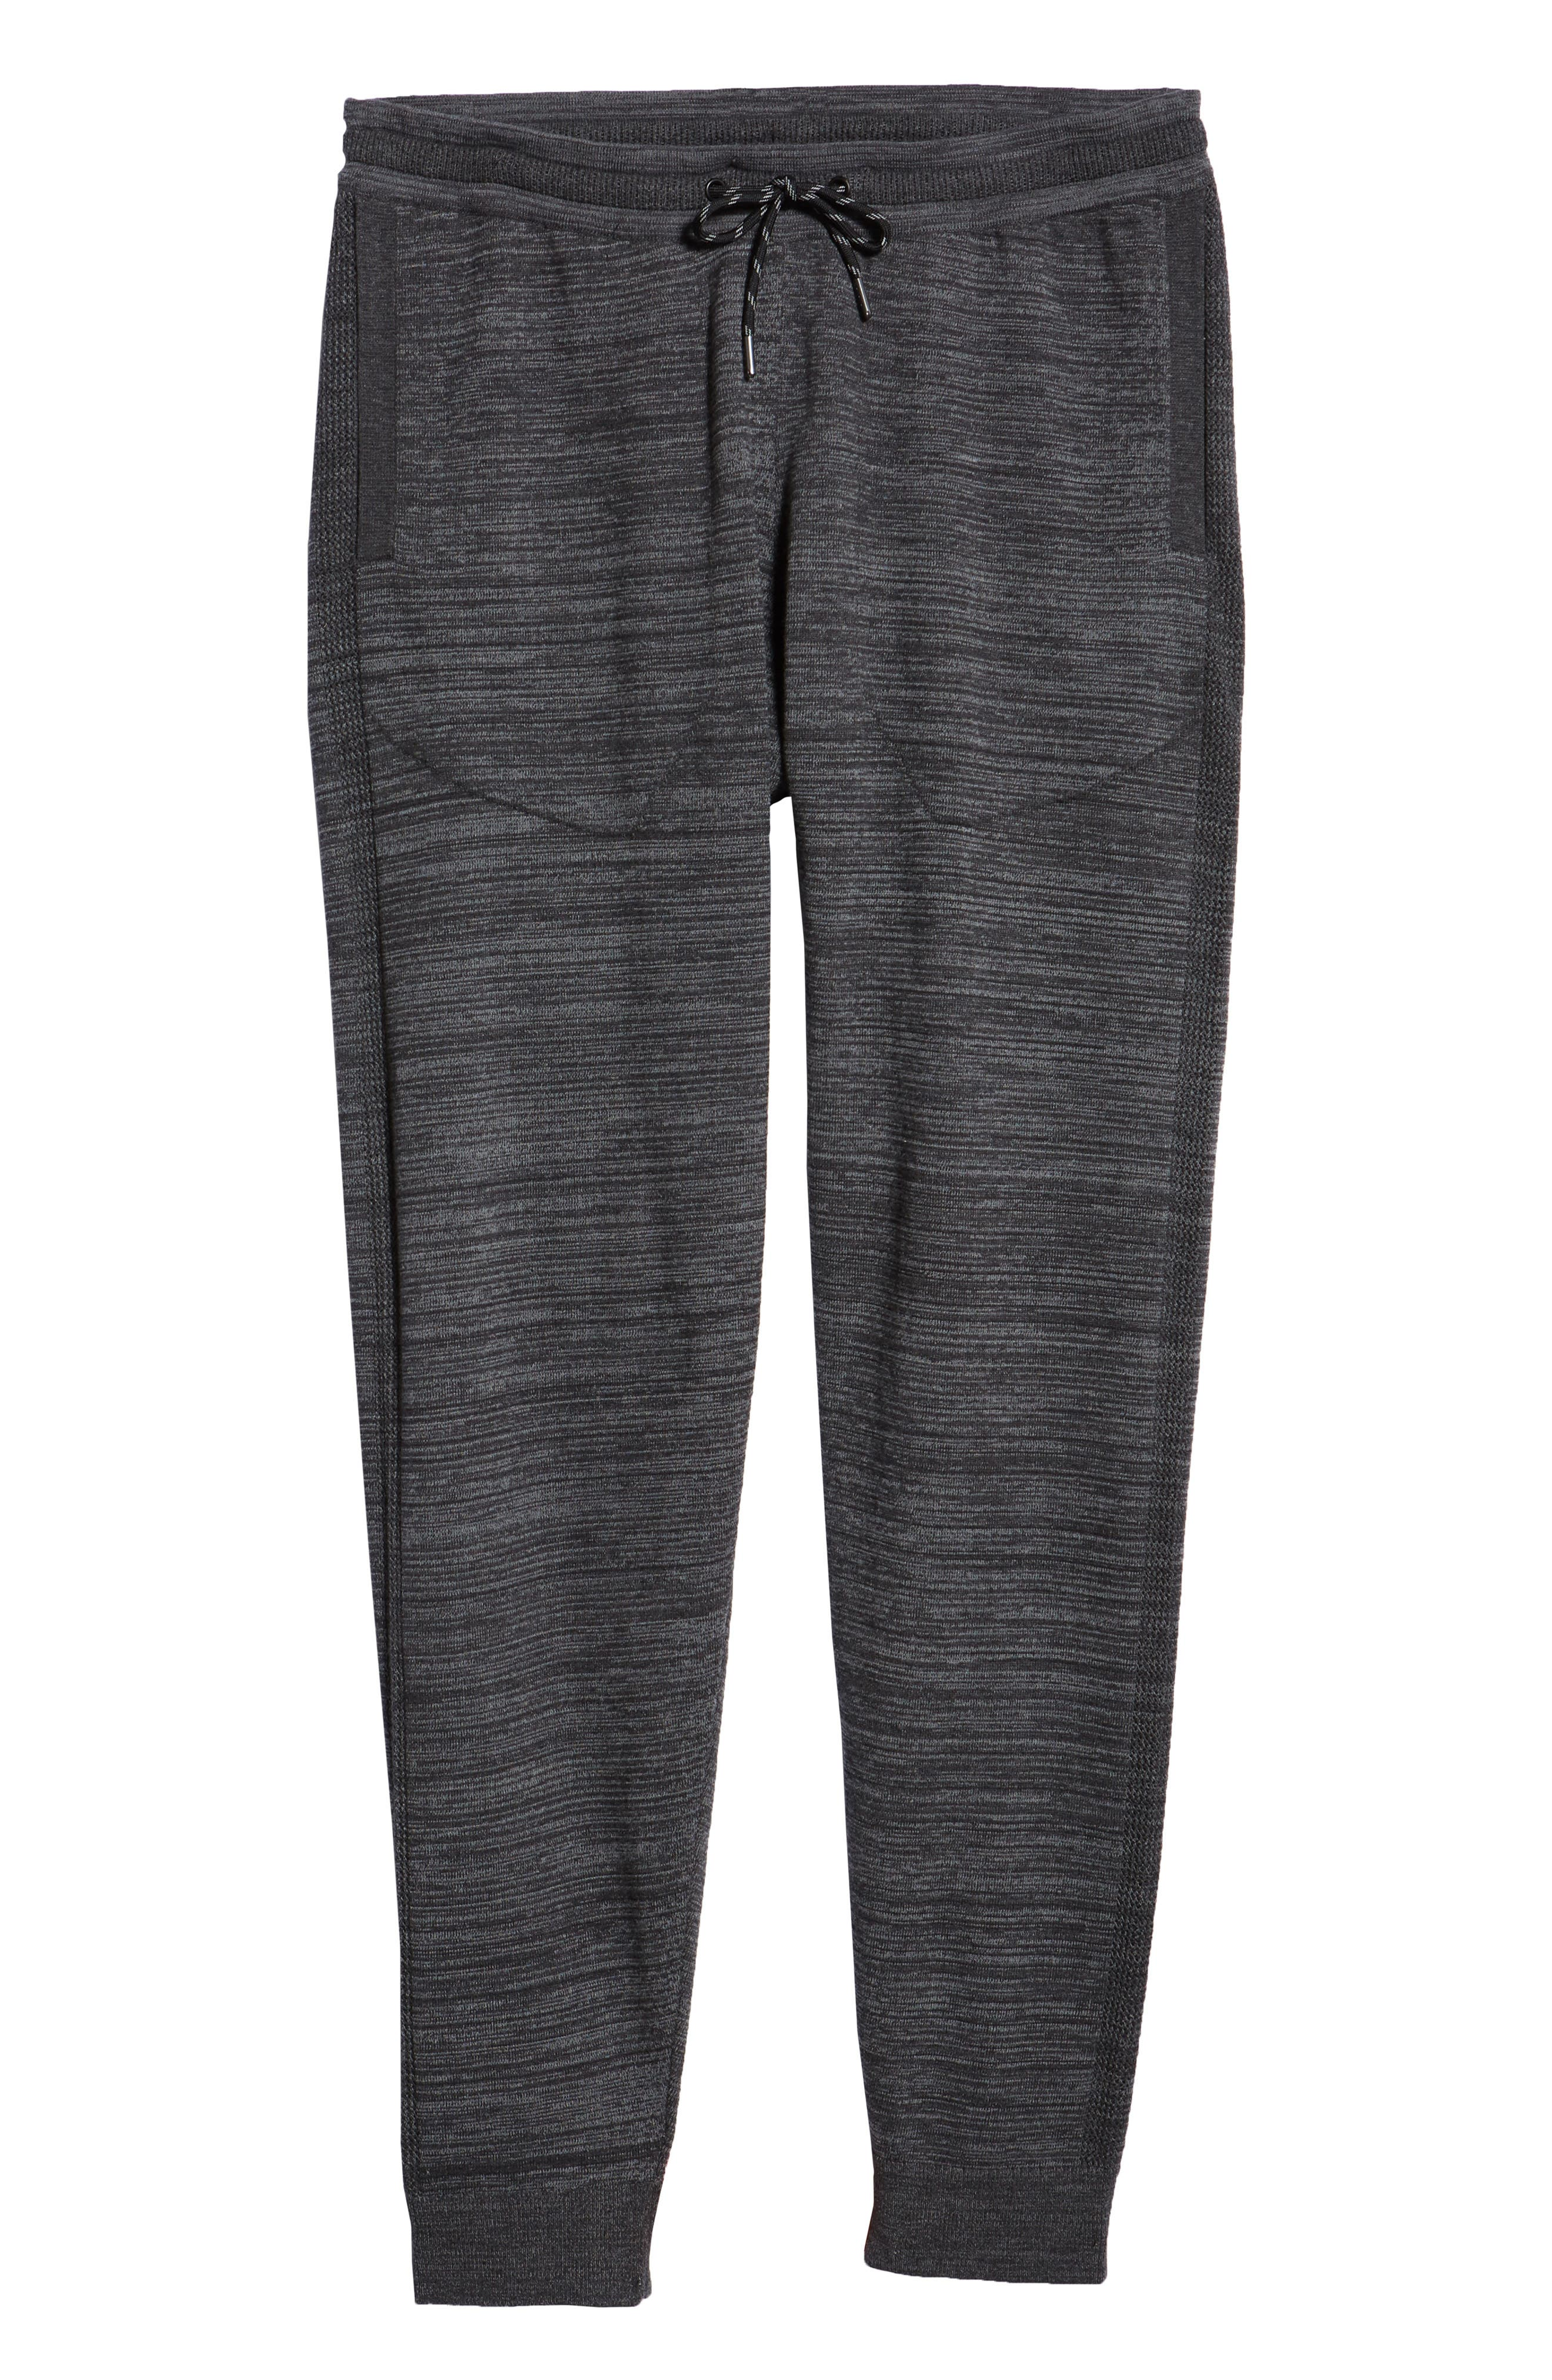 Tech Sweater Knit Jogger Pants,                             Alternate thumbnail 6, color,                             BLACK OXIDE SPACEDYE